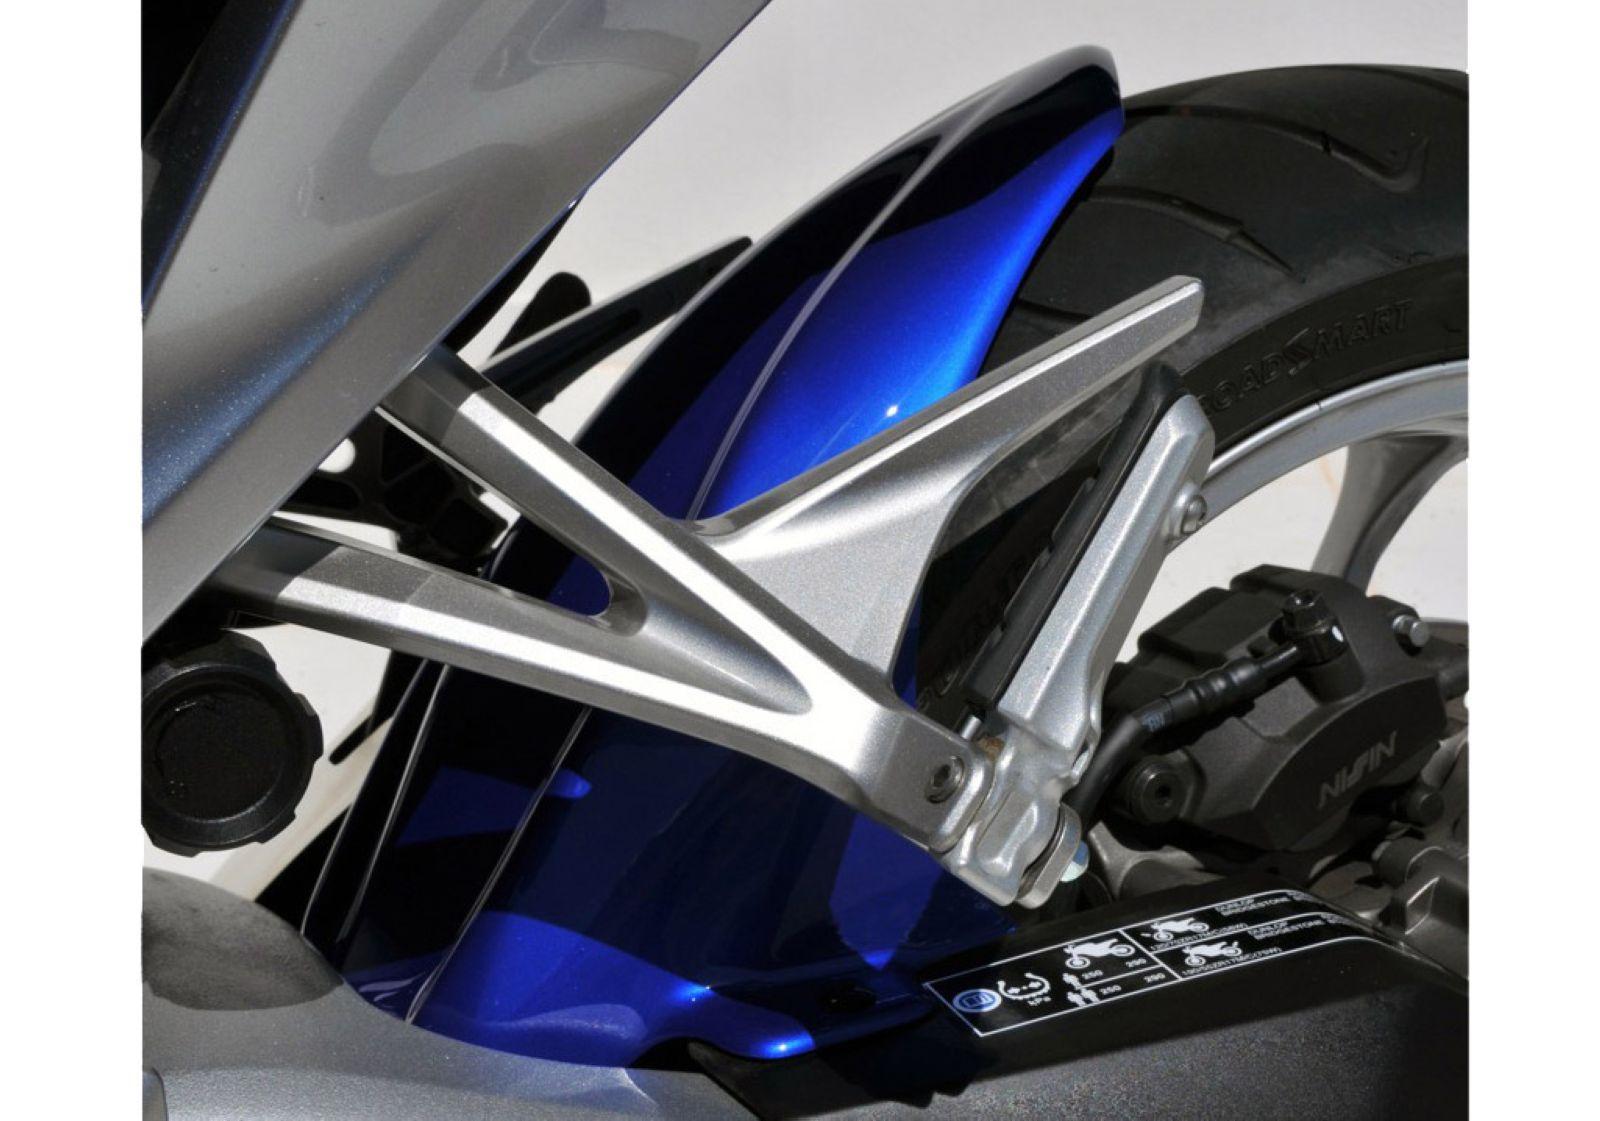 Aluminium Fairing Kit Suzuki GSR750 Blue